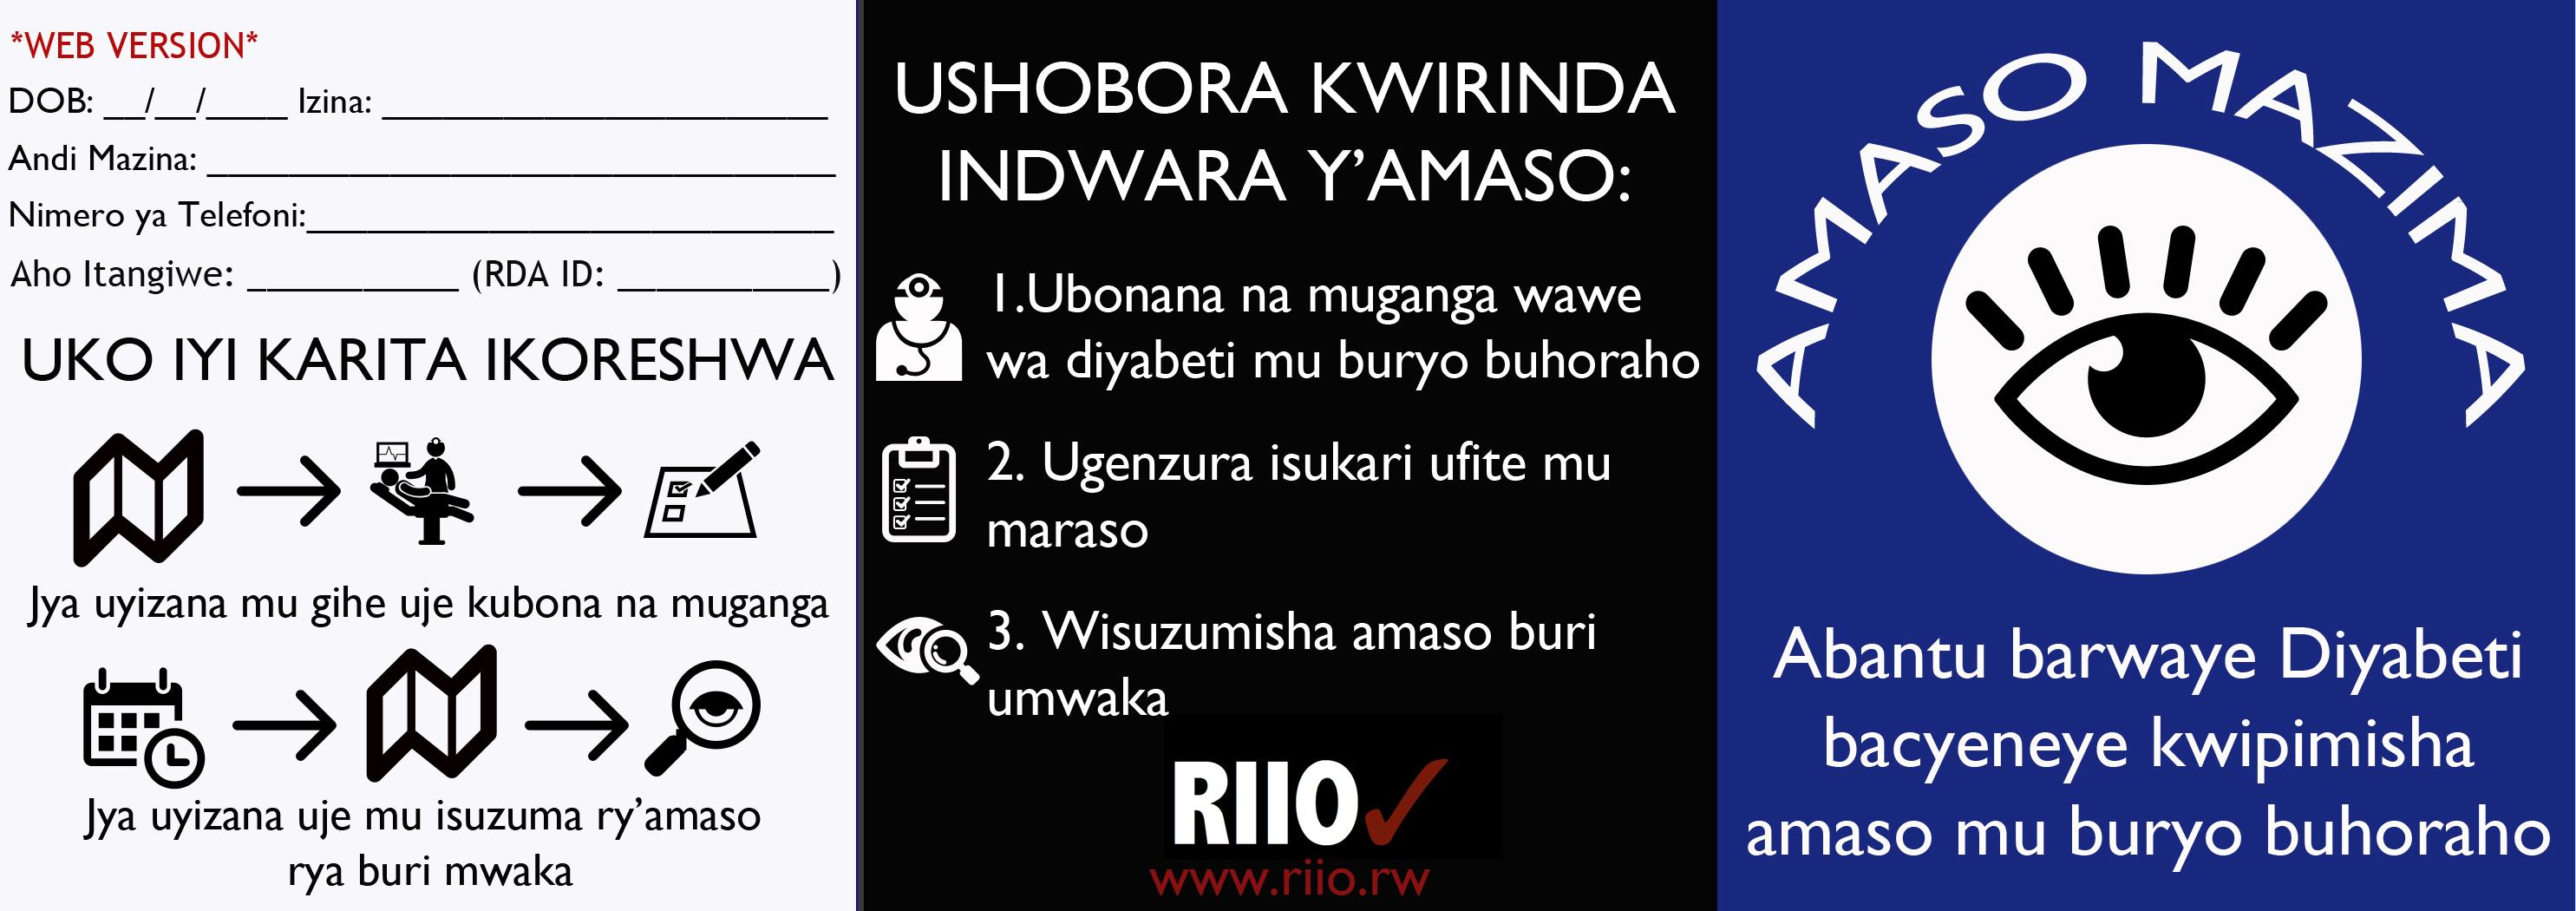 R2S Outside Kinyarwanda - WEB